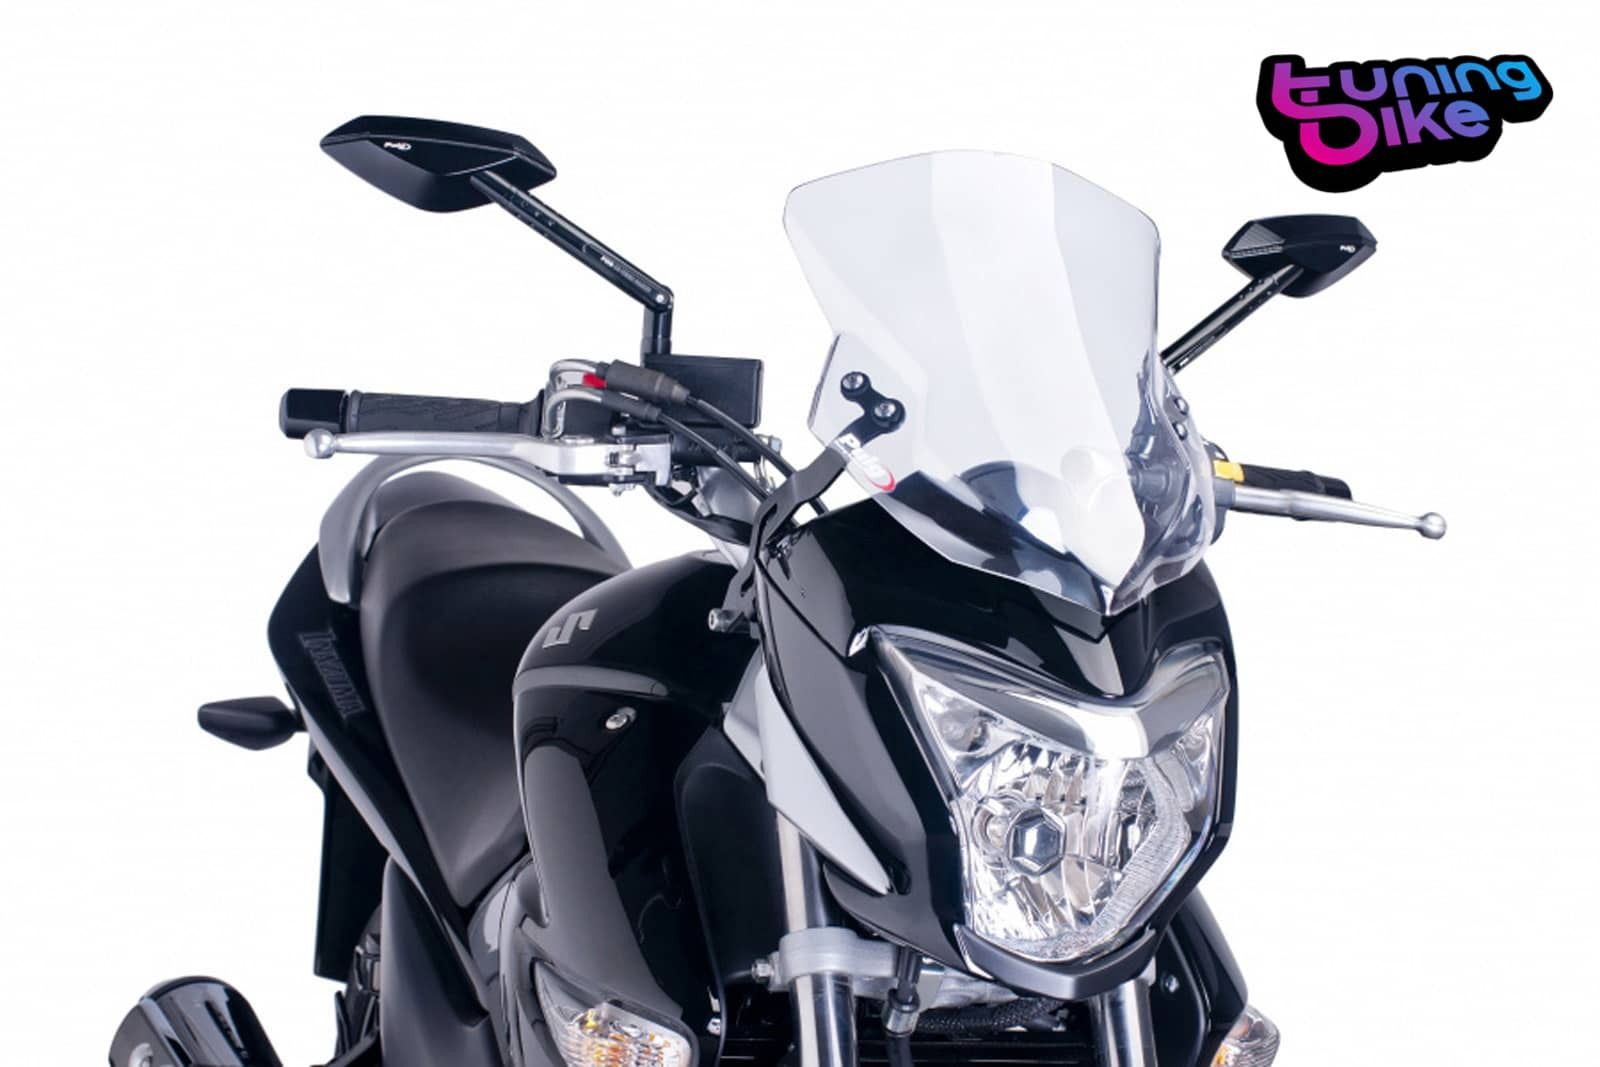 Cupolino Puig Sport Suzuki Inazuma 250 12-17 Naked New Generation trasparente